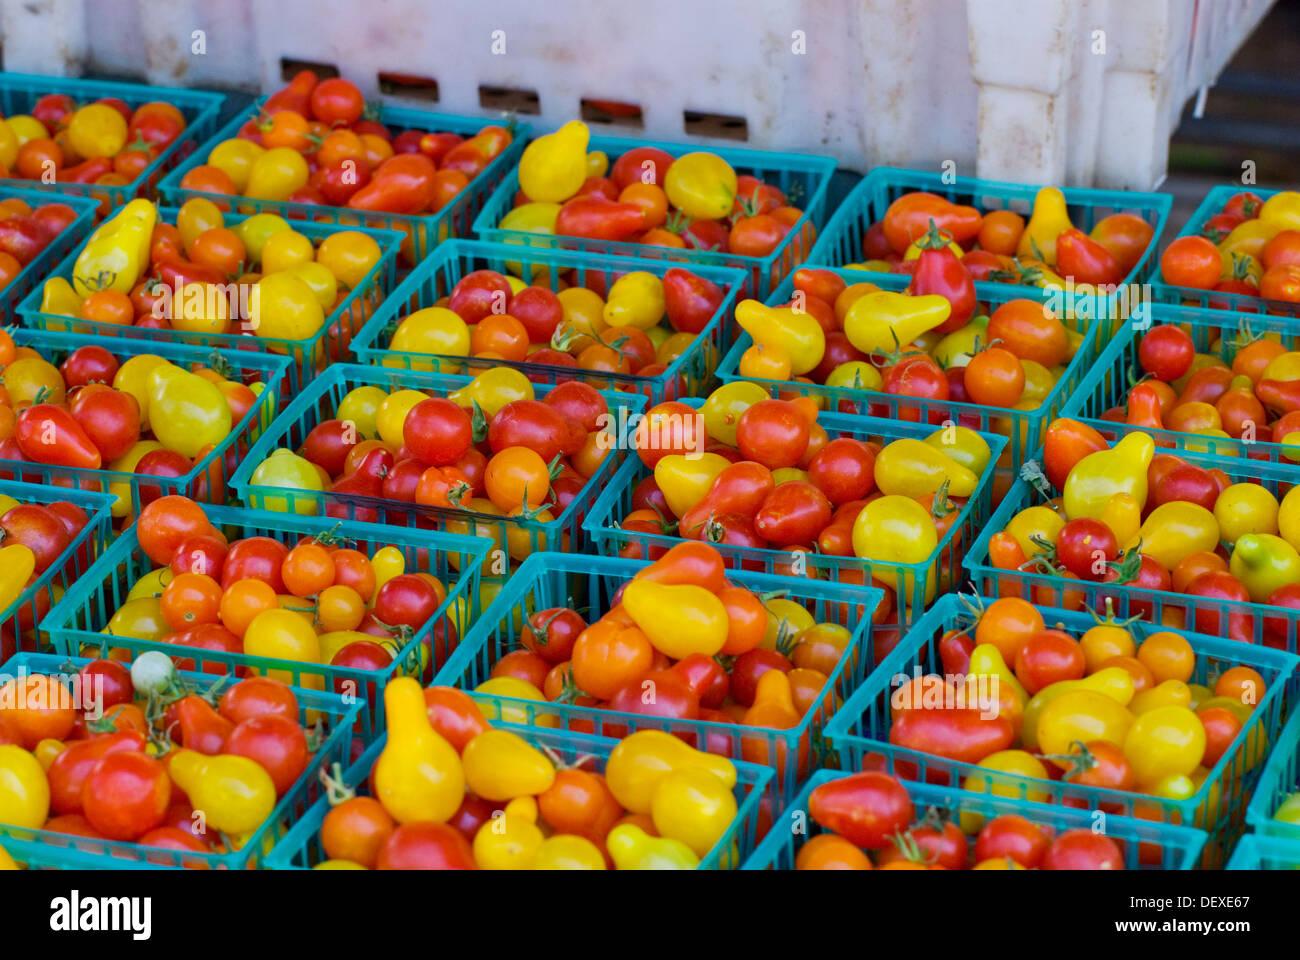 Organic tomatoes at farmers market in upscale California city near San Francisco - Stock Image